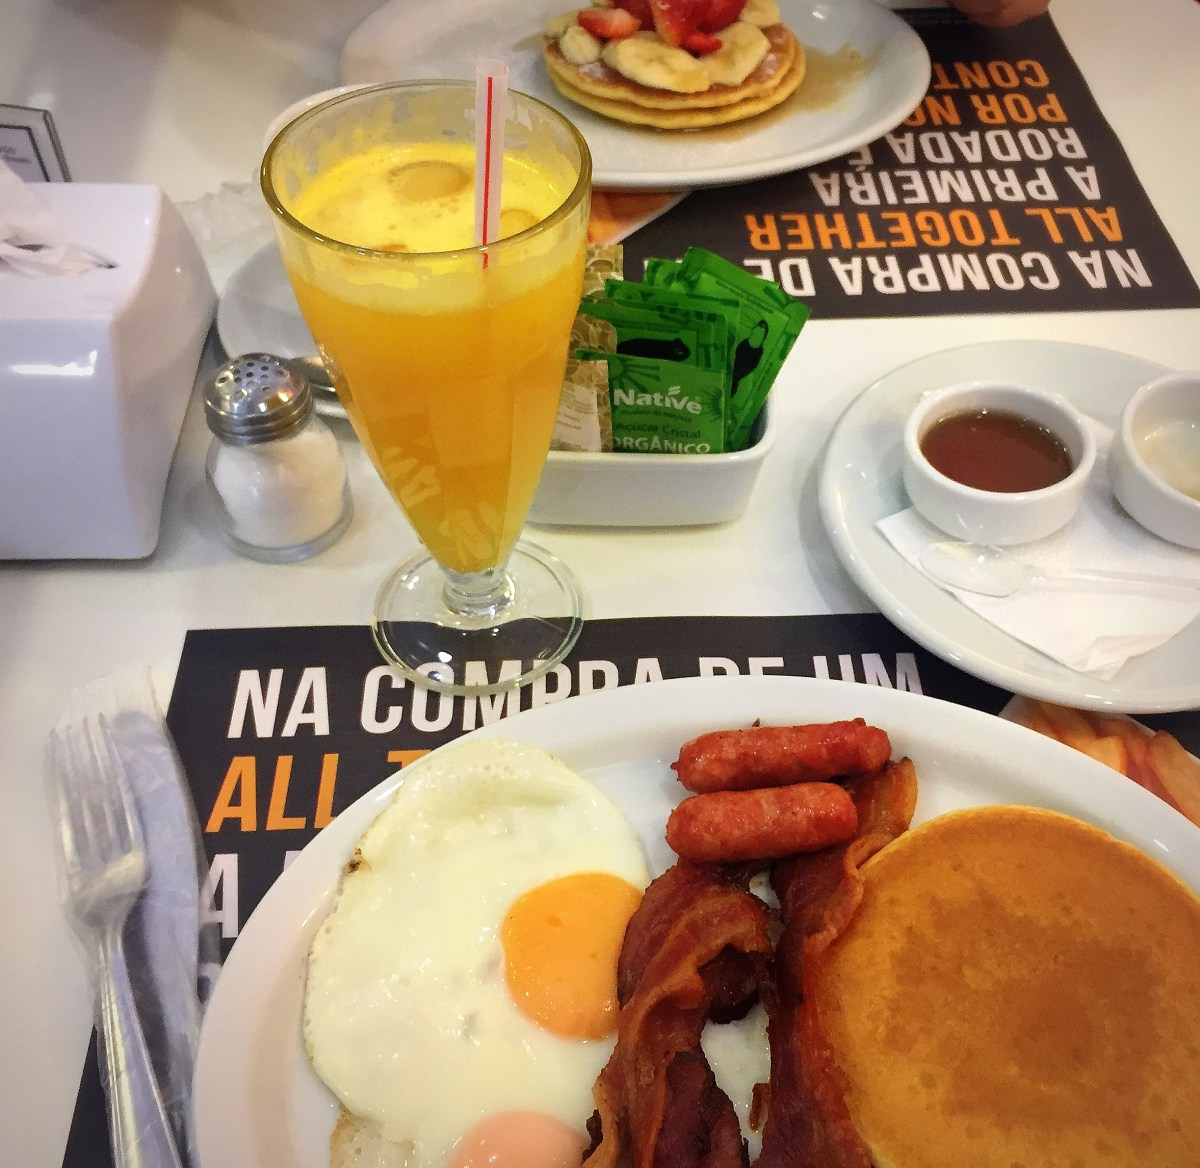 Breakfast - A Chapa - Panquecas americanas #resenhagastronômica